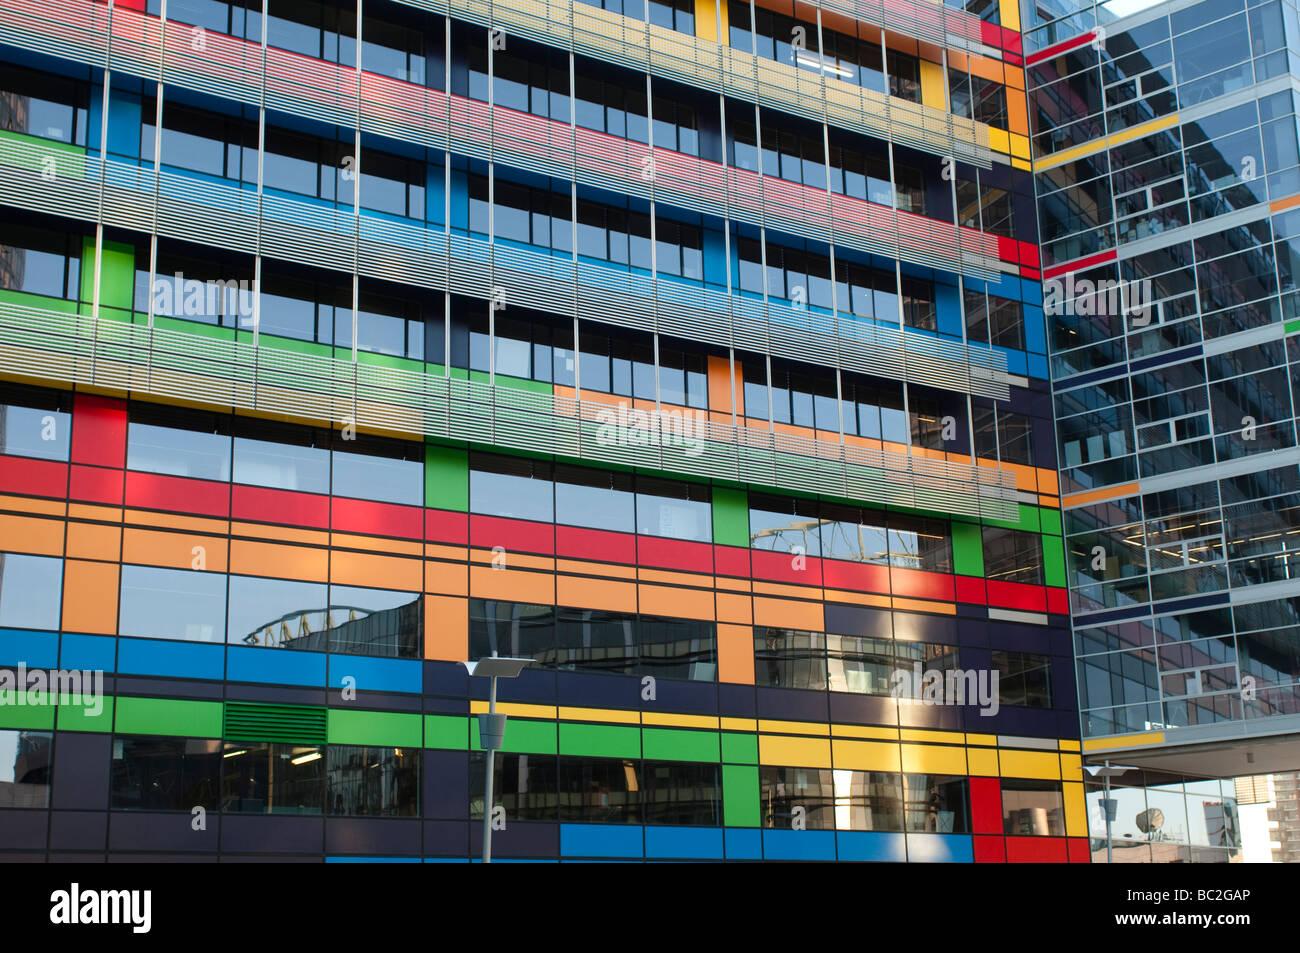 NAB building, Victoria harbour, Docklands, Melbourne, Victoria, Australia - Stock Image